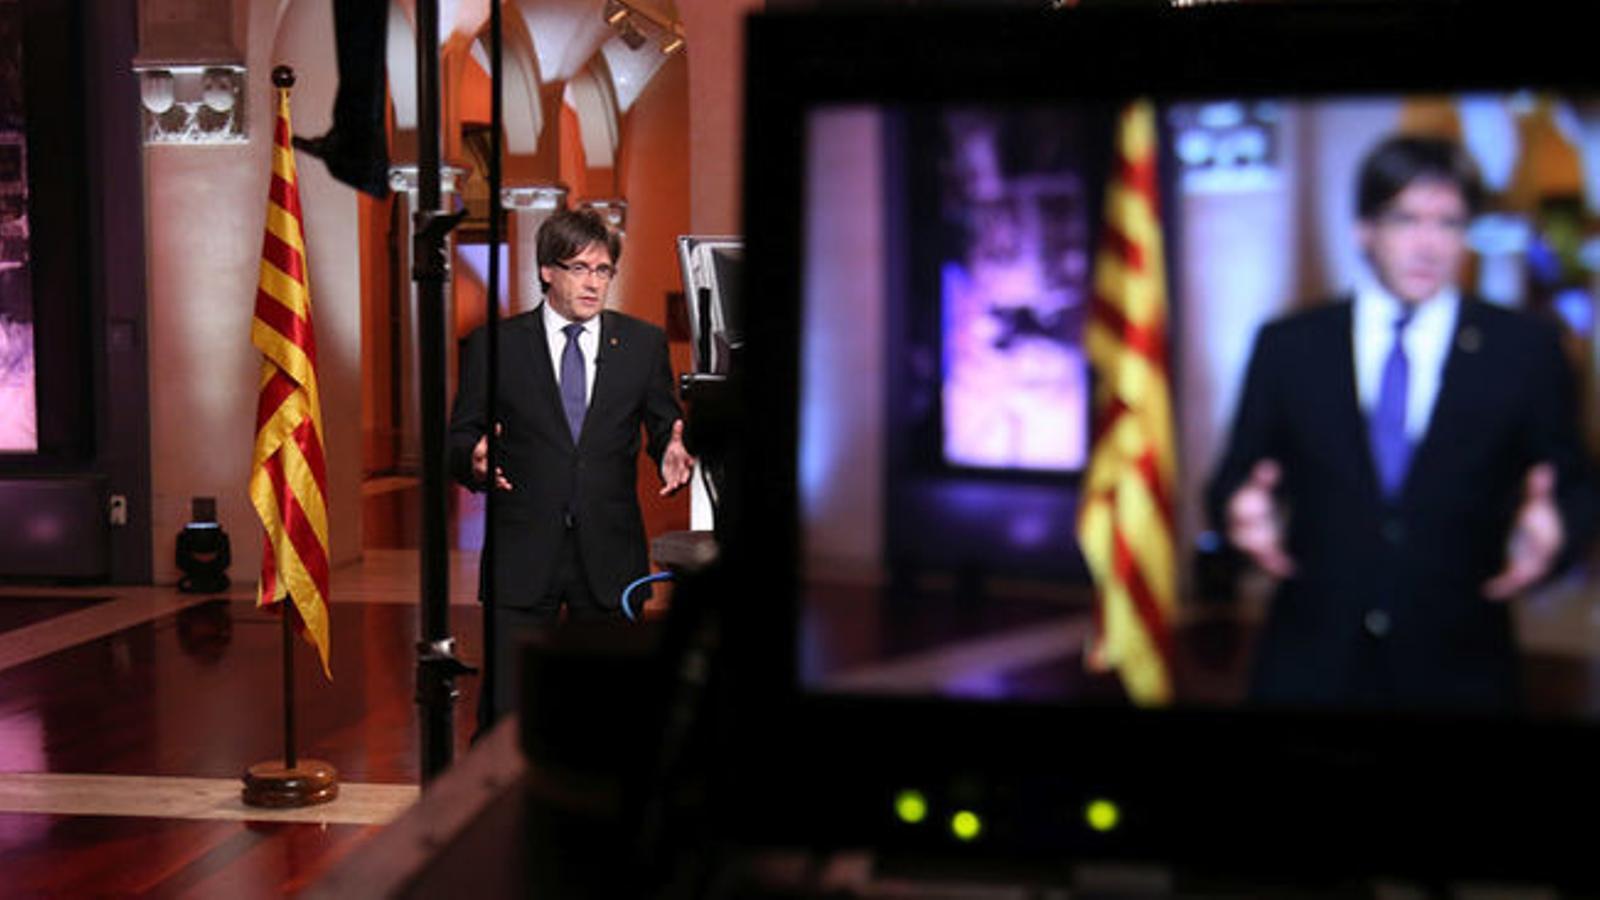 El discurs del president, Carles Puigdemont, en directe